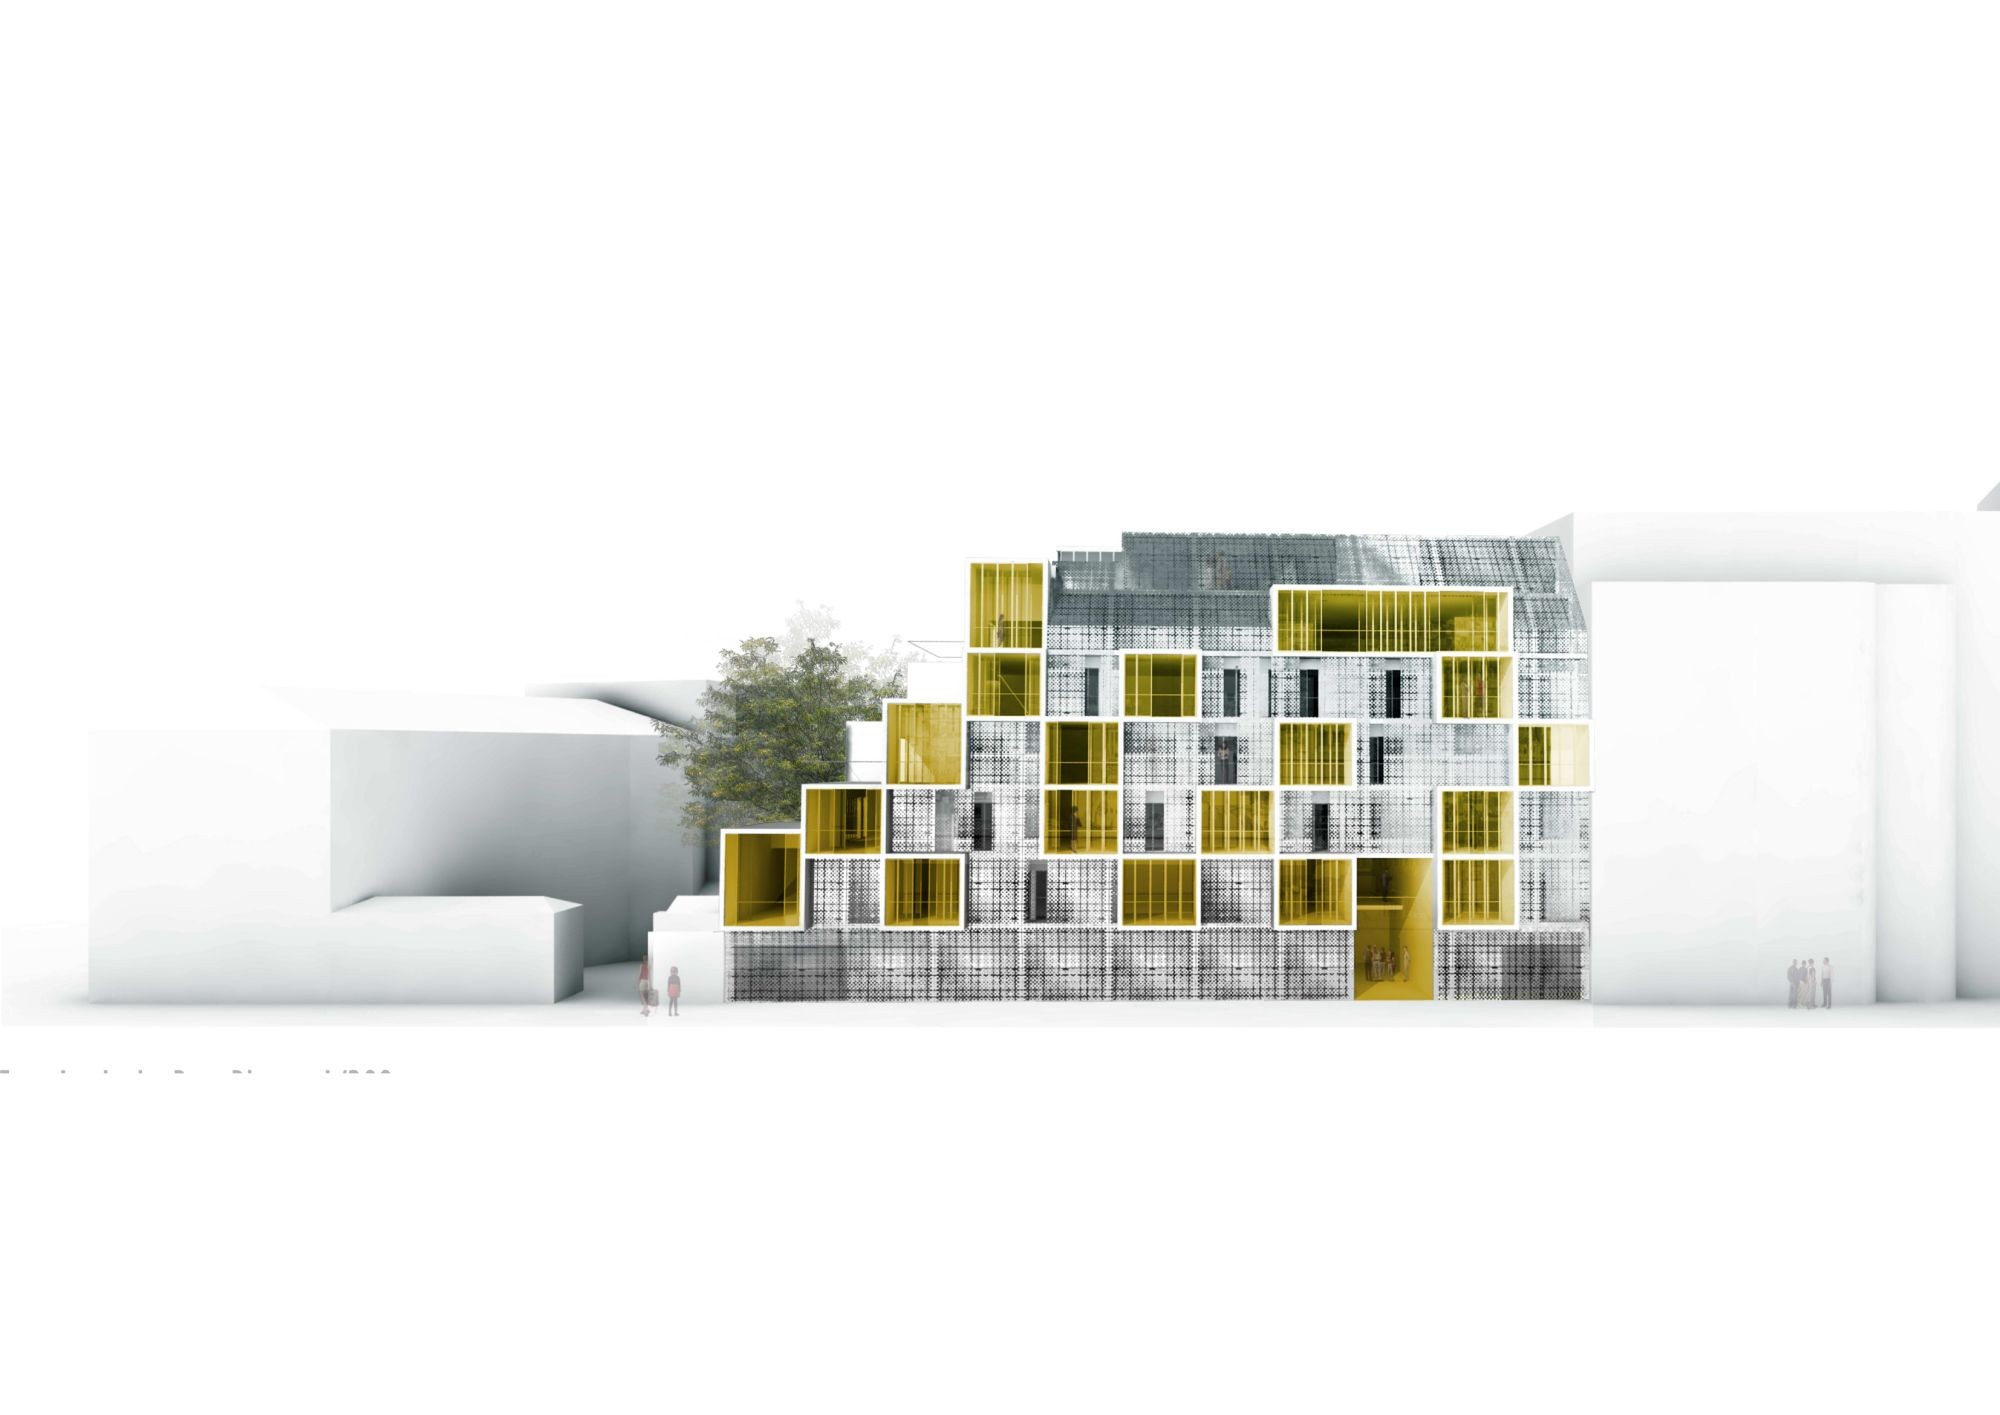 gallery of plein soleil rh architecture 33. Black Bedroom Furniture Sets. Home Design Ideas